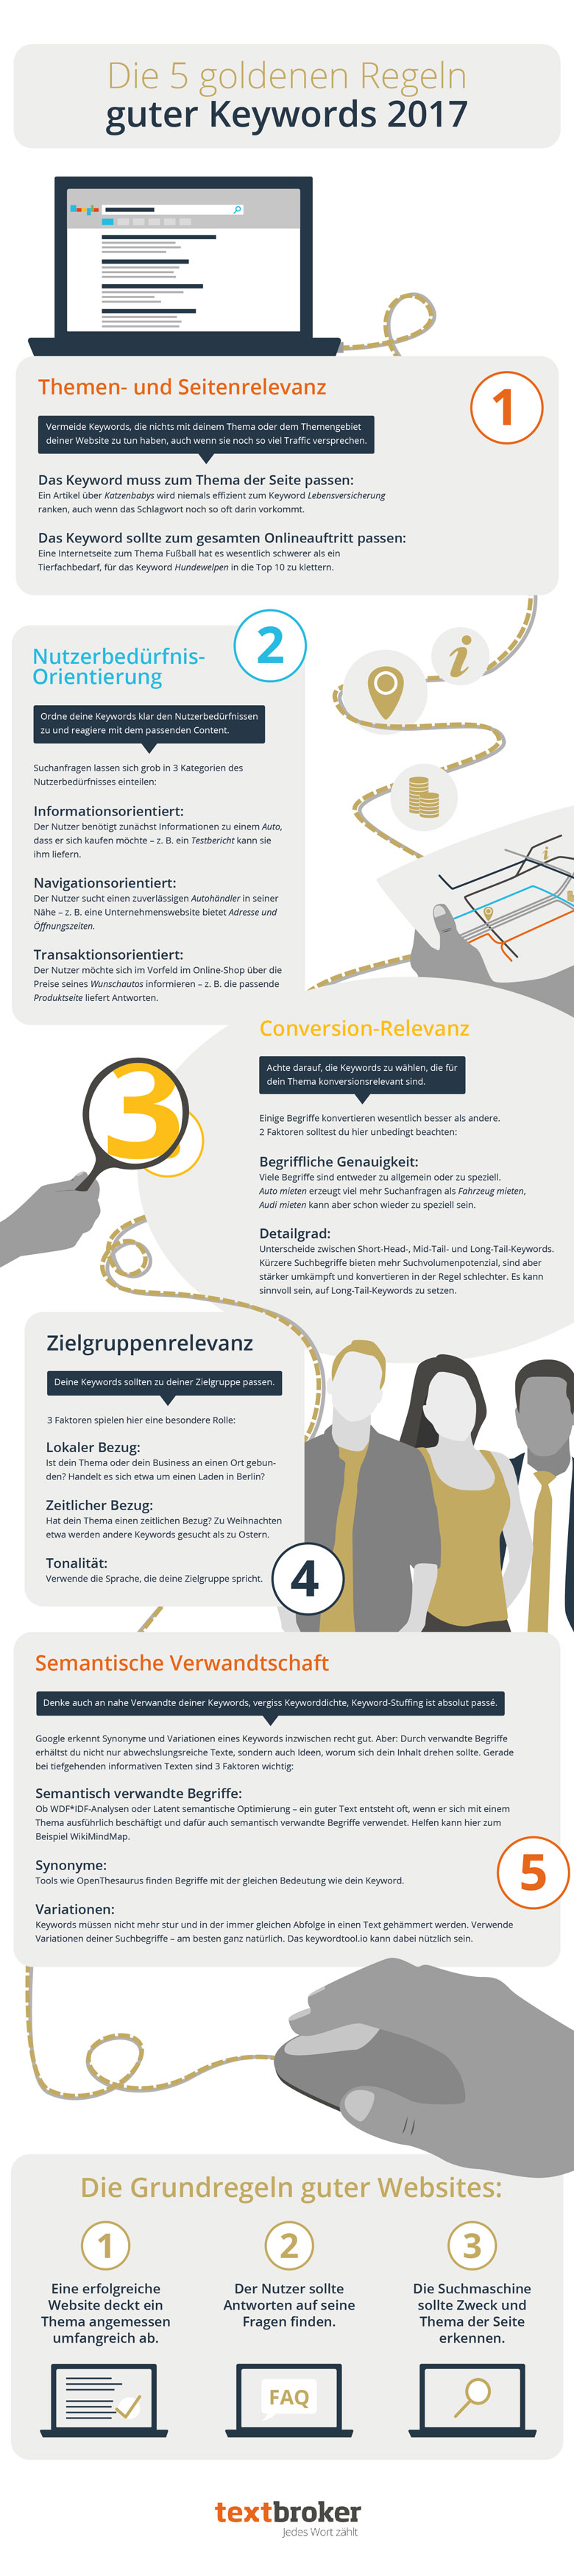 Infografik zur Keywordrecherche